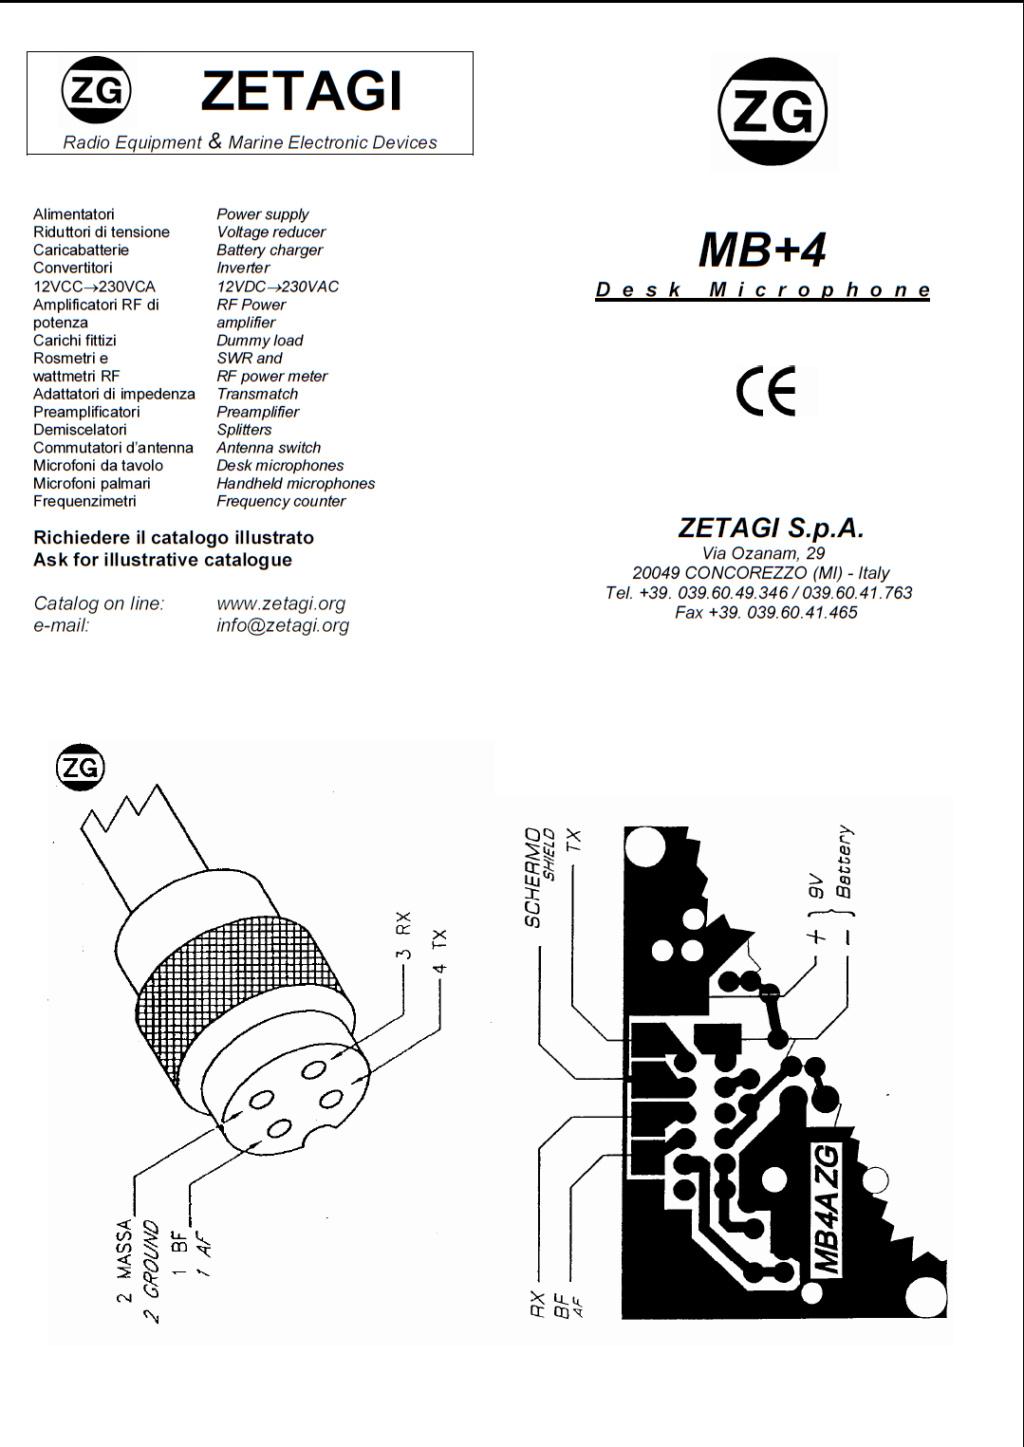 Zetagi MB+4 (Micro de table) Captur57